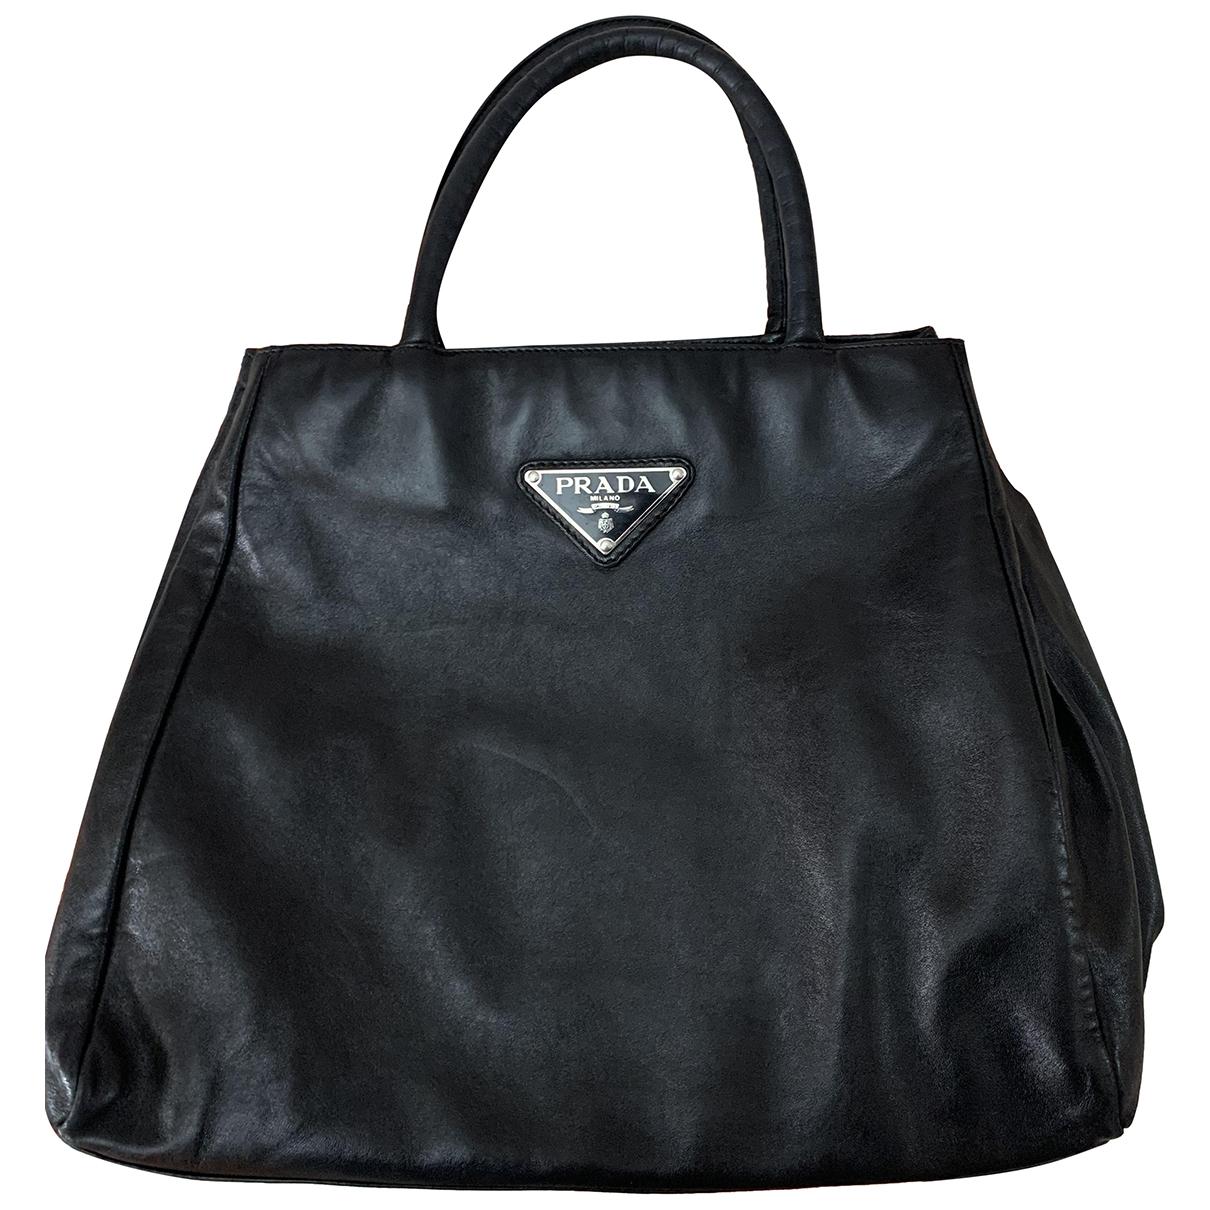 Prada N Black Leather handbag for Women N